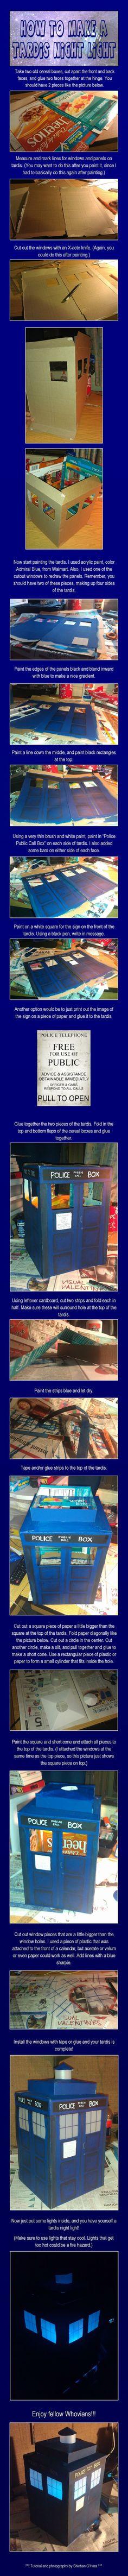 How to make a Tardis Night Light! #doctorwho #tardis #geek #crafts